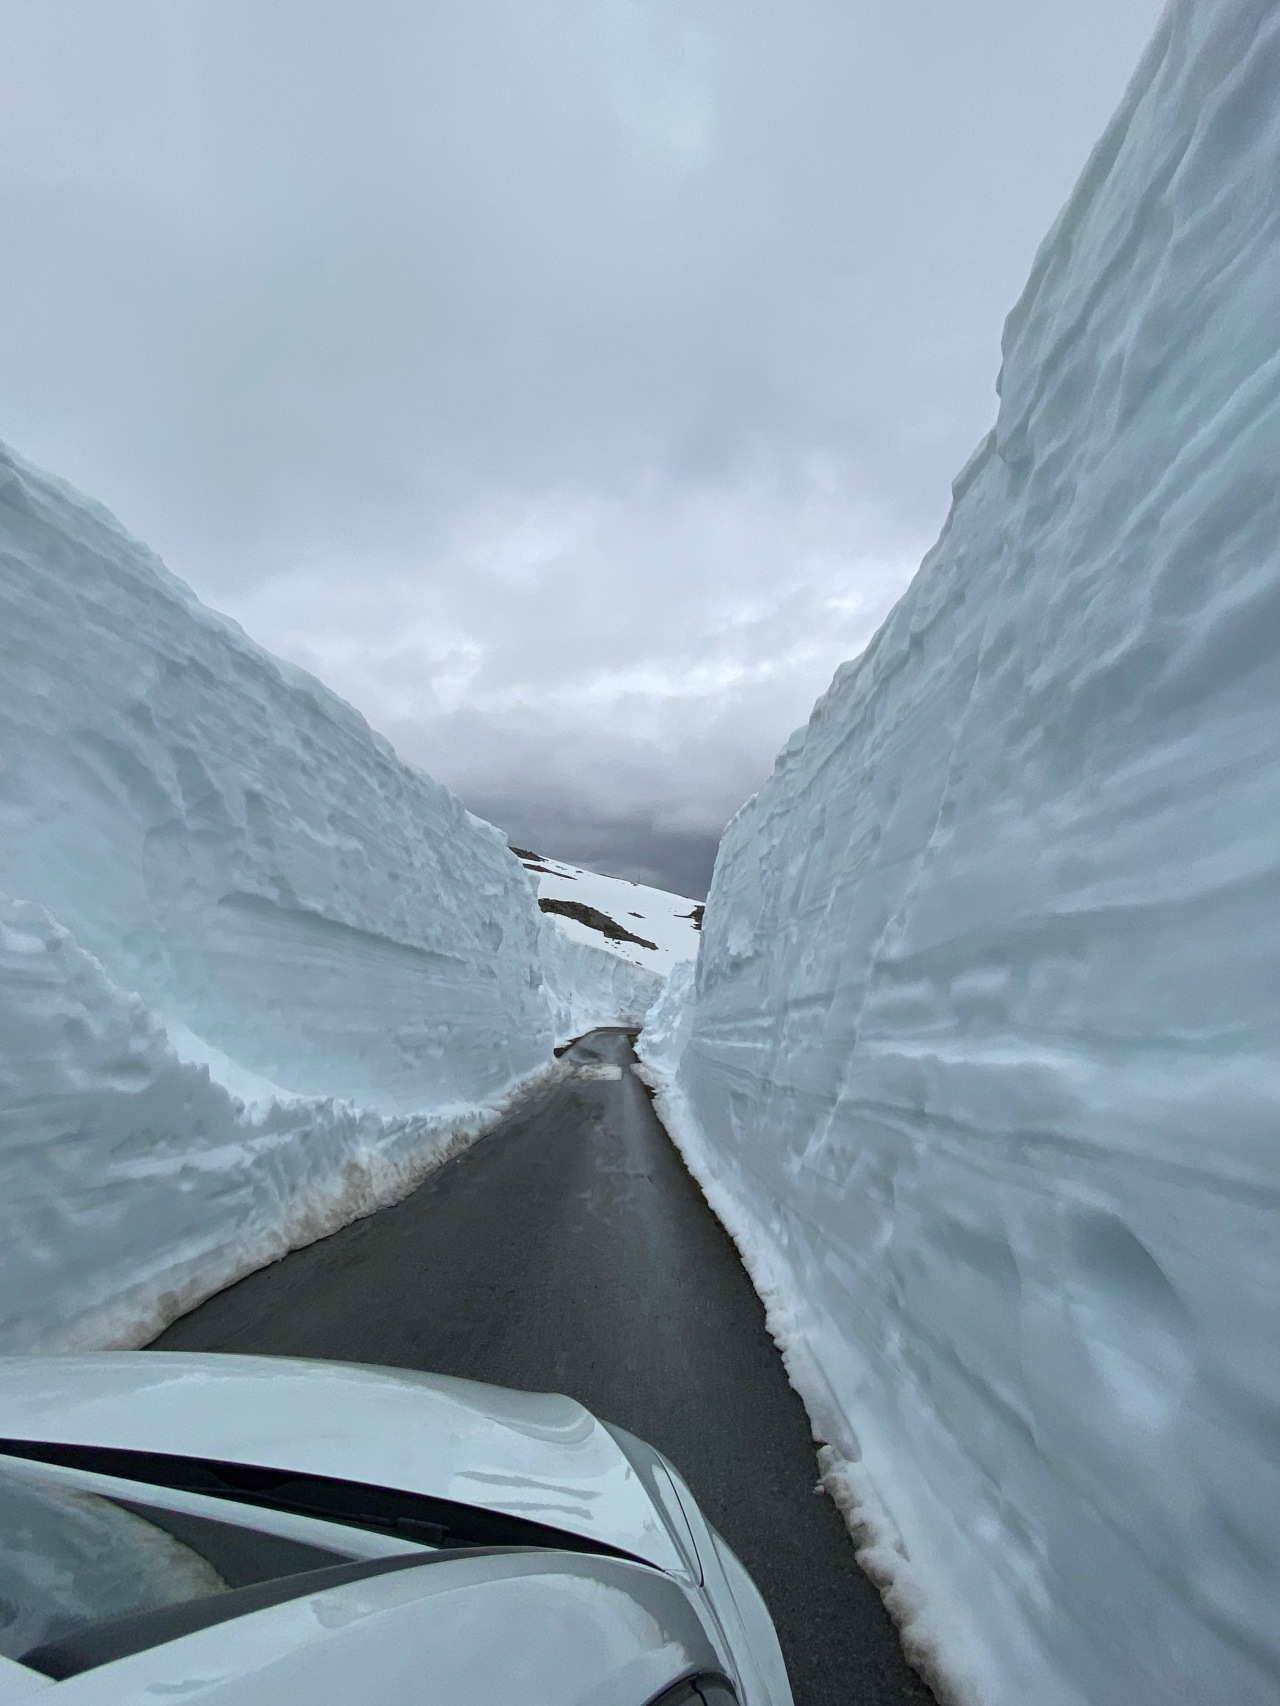 Norwegian scenic byroads, Brokke – Suleskard summer road and to the Lysebotn fjord ferry ride under Pulpitrock